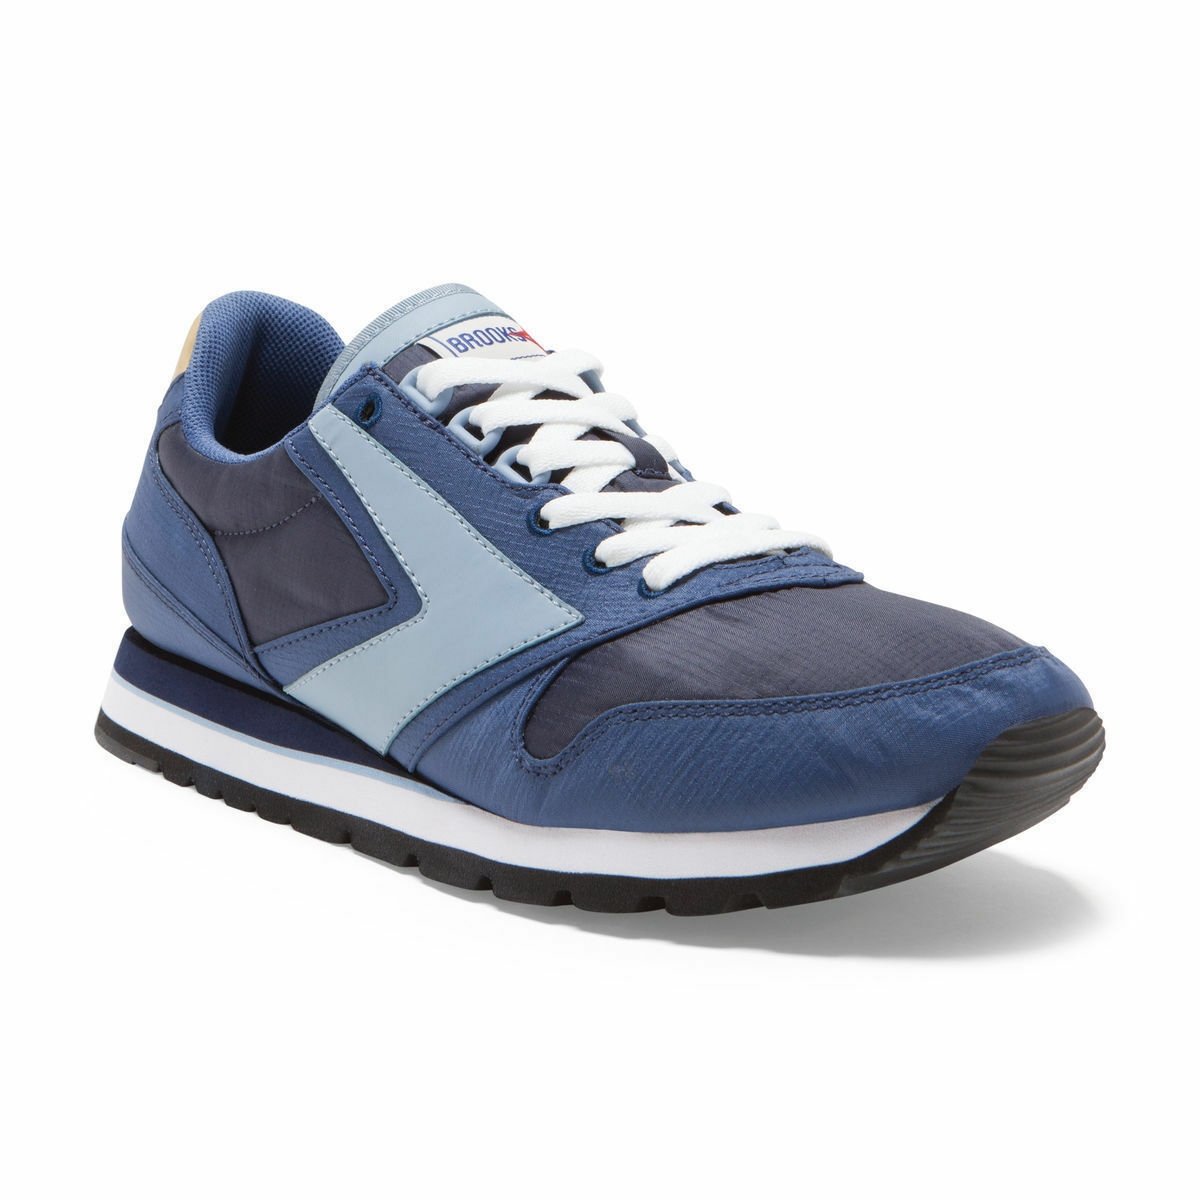 Brooks Men's Chariot 110178 1D 467 TrueNavy Peacoat Dustybluee Running shoes